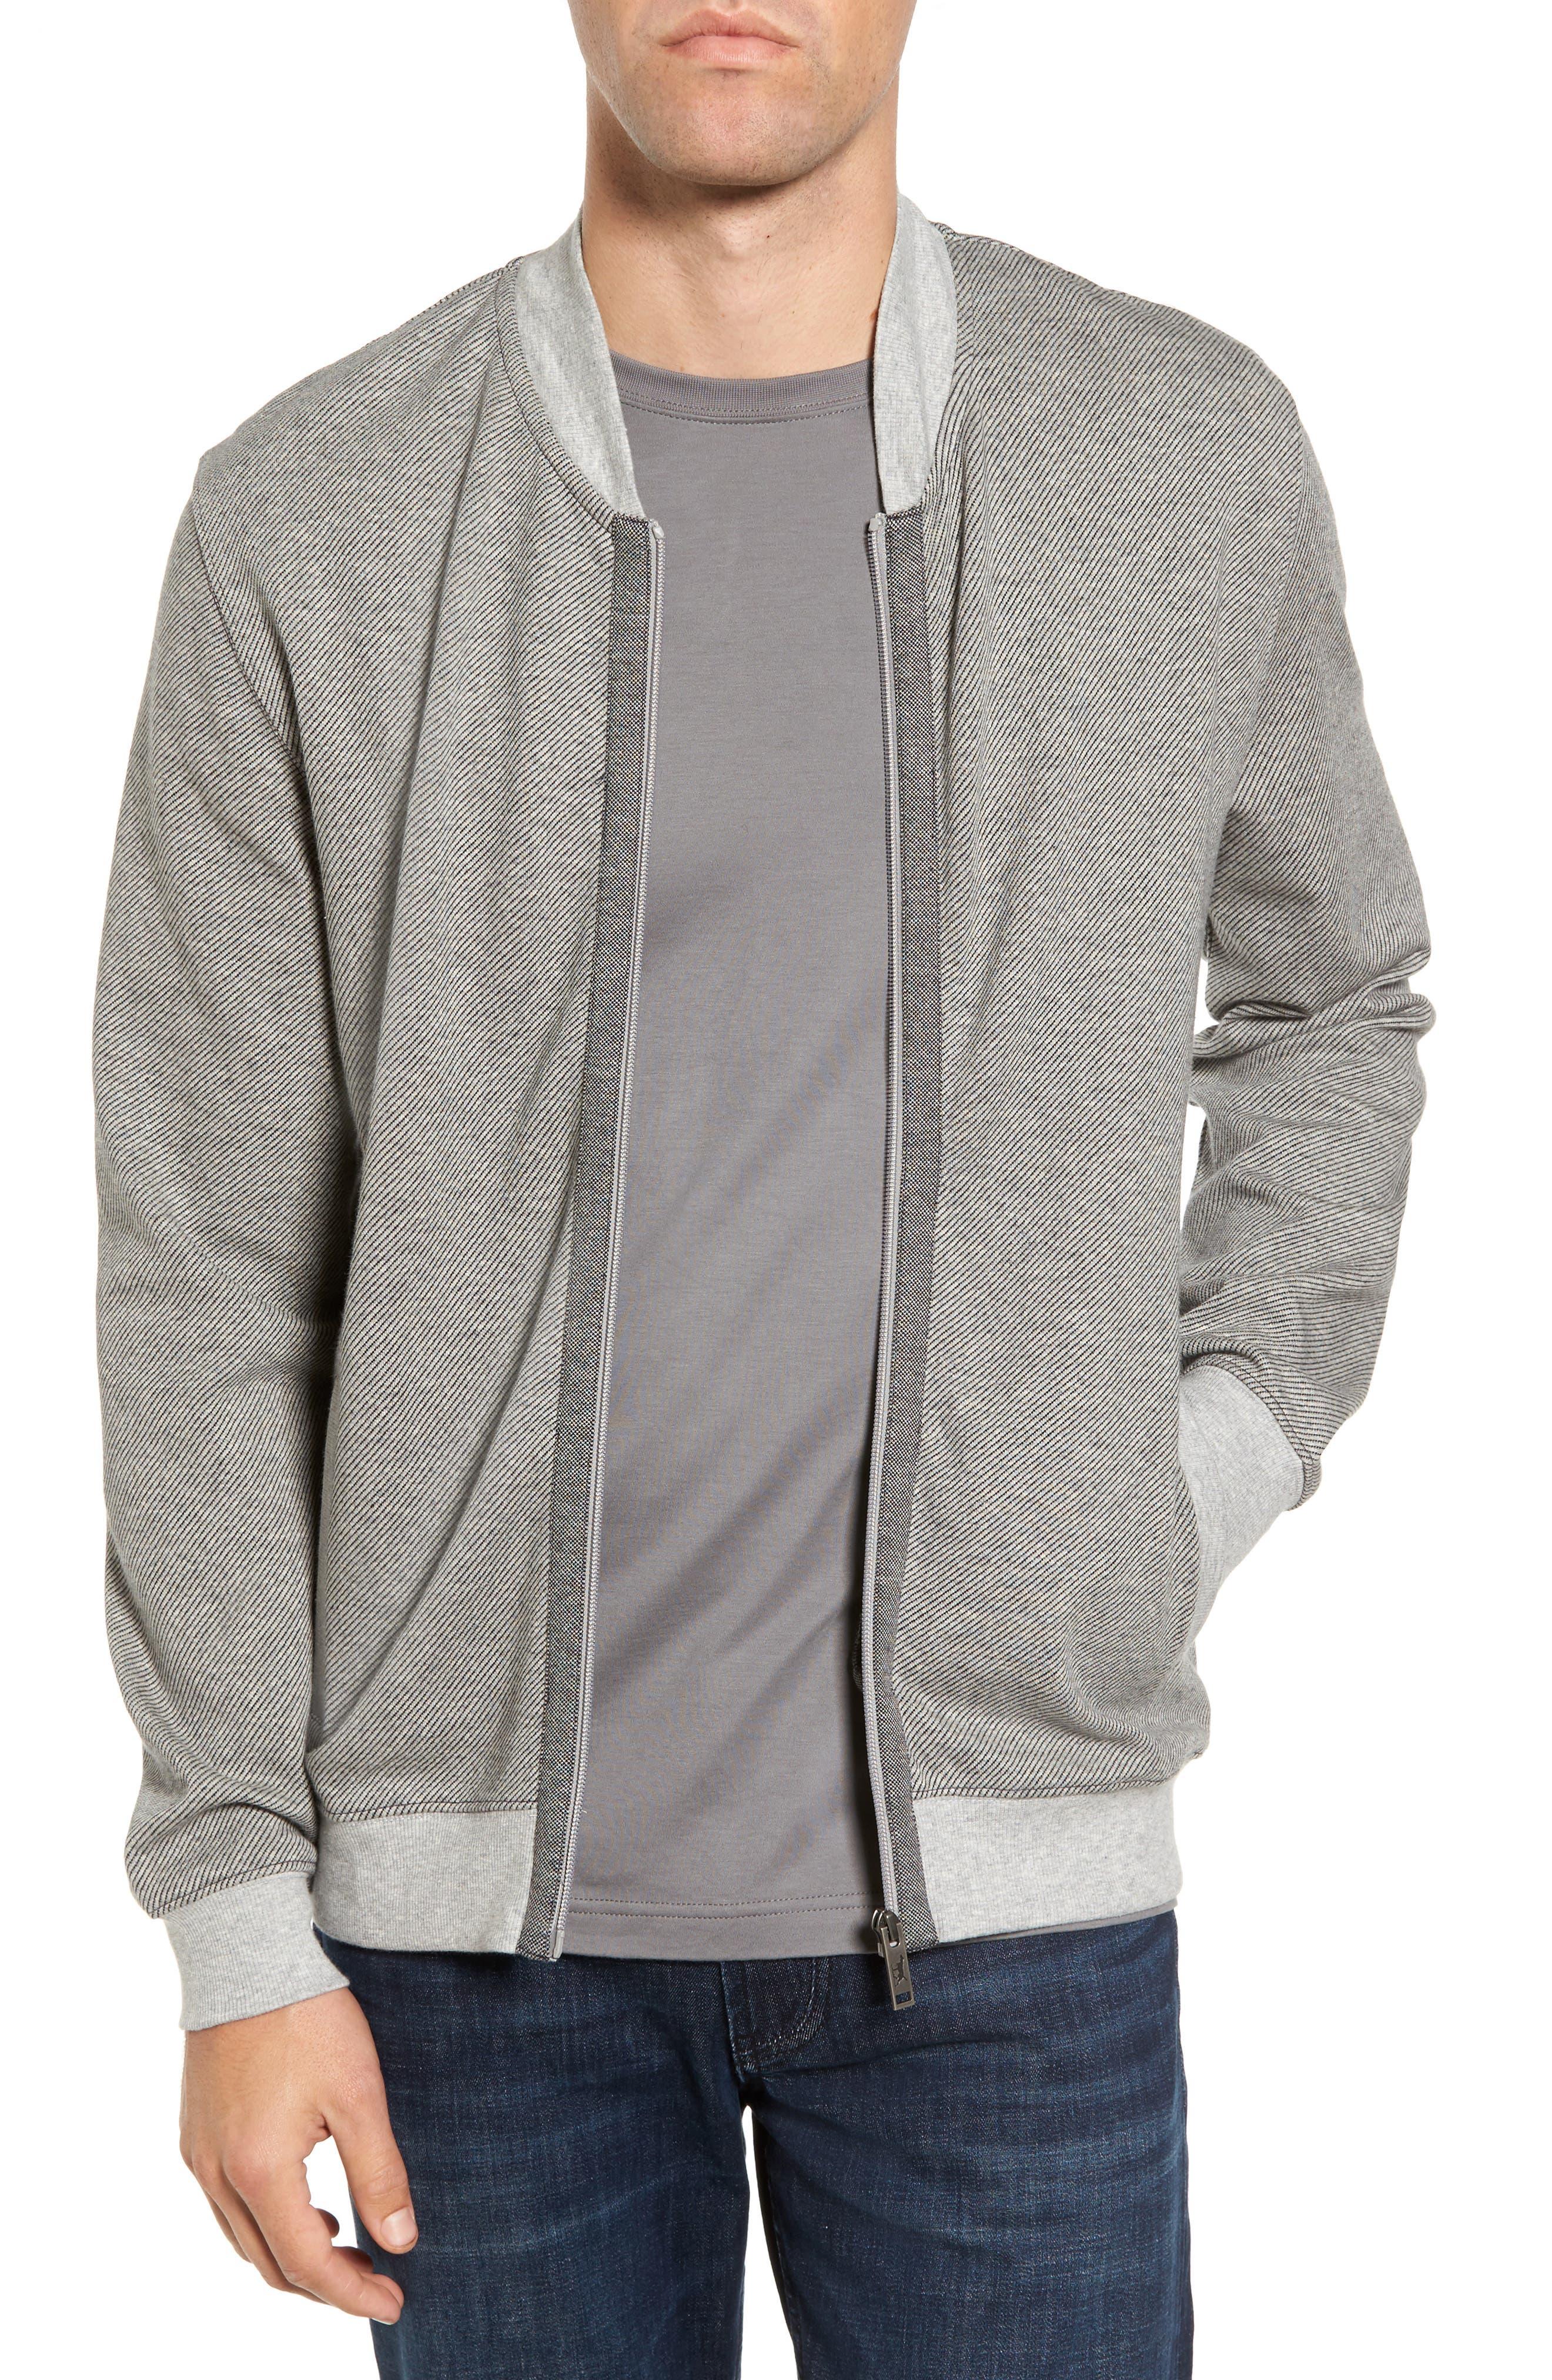 Alderson Ave Fleece Jacket,                             Main thumbnail 1, color,                             020